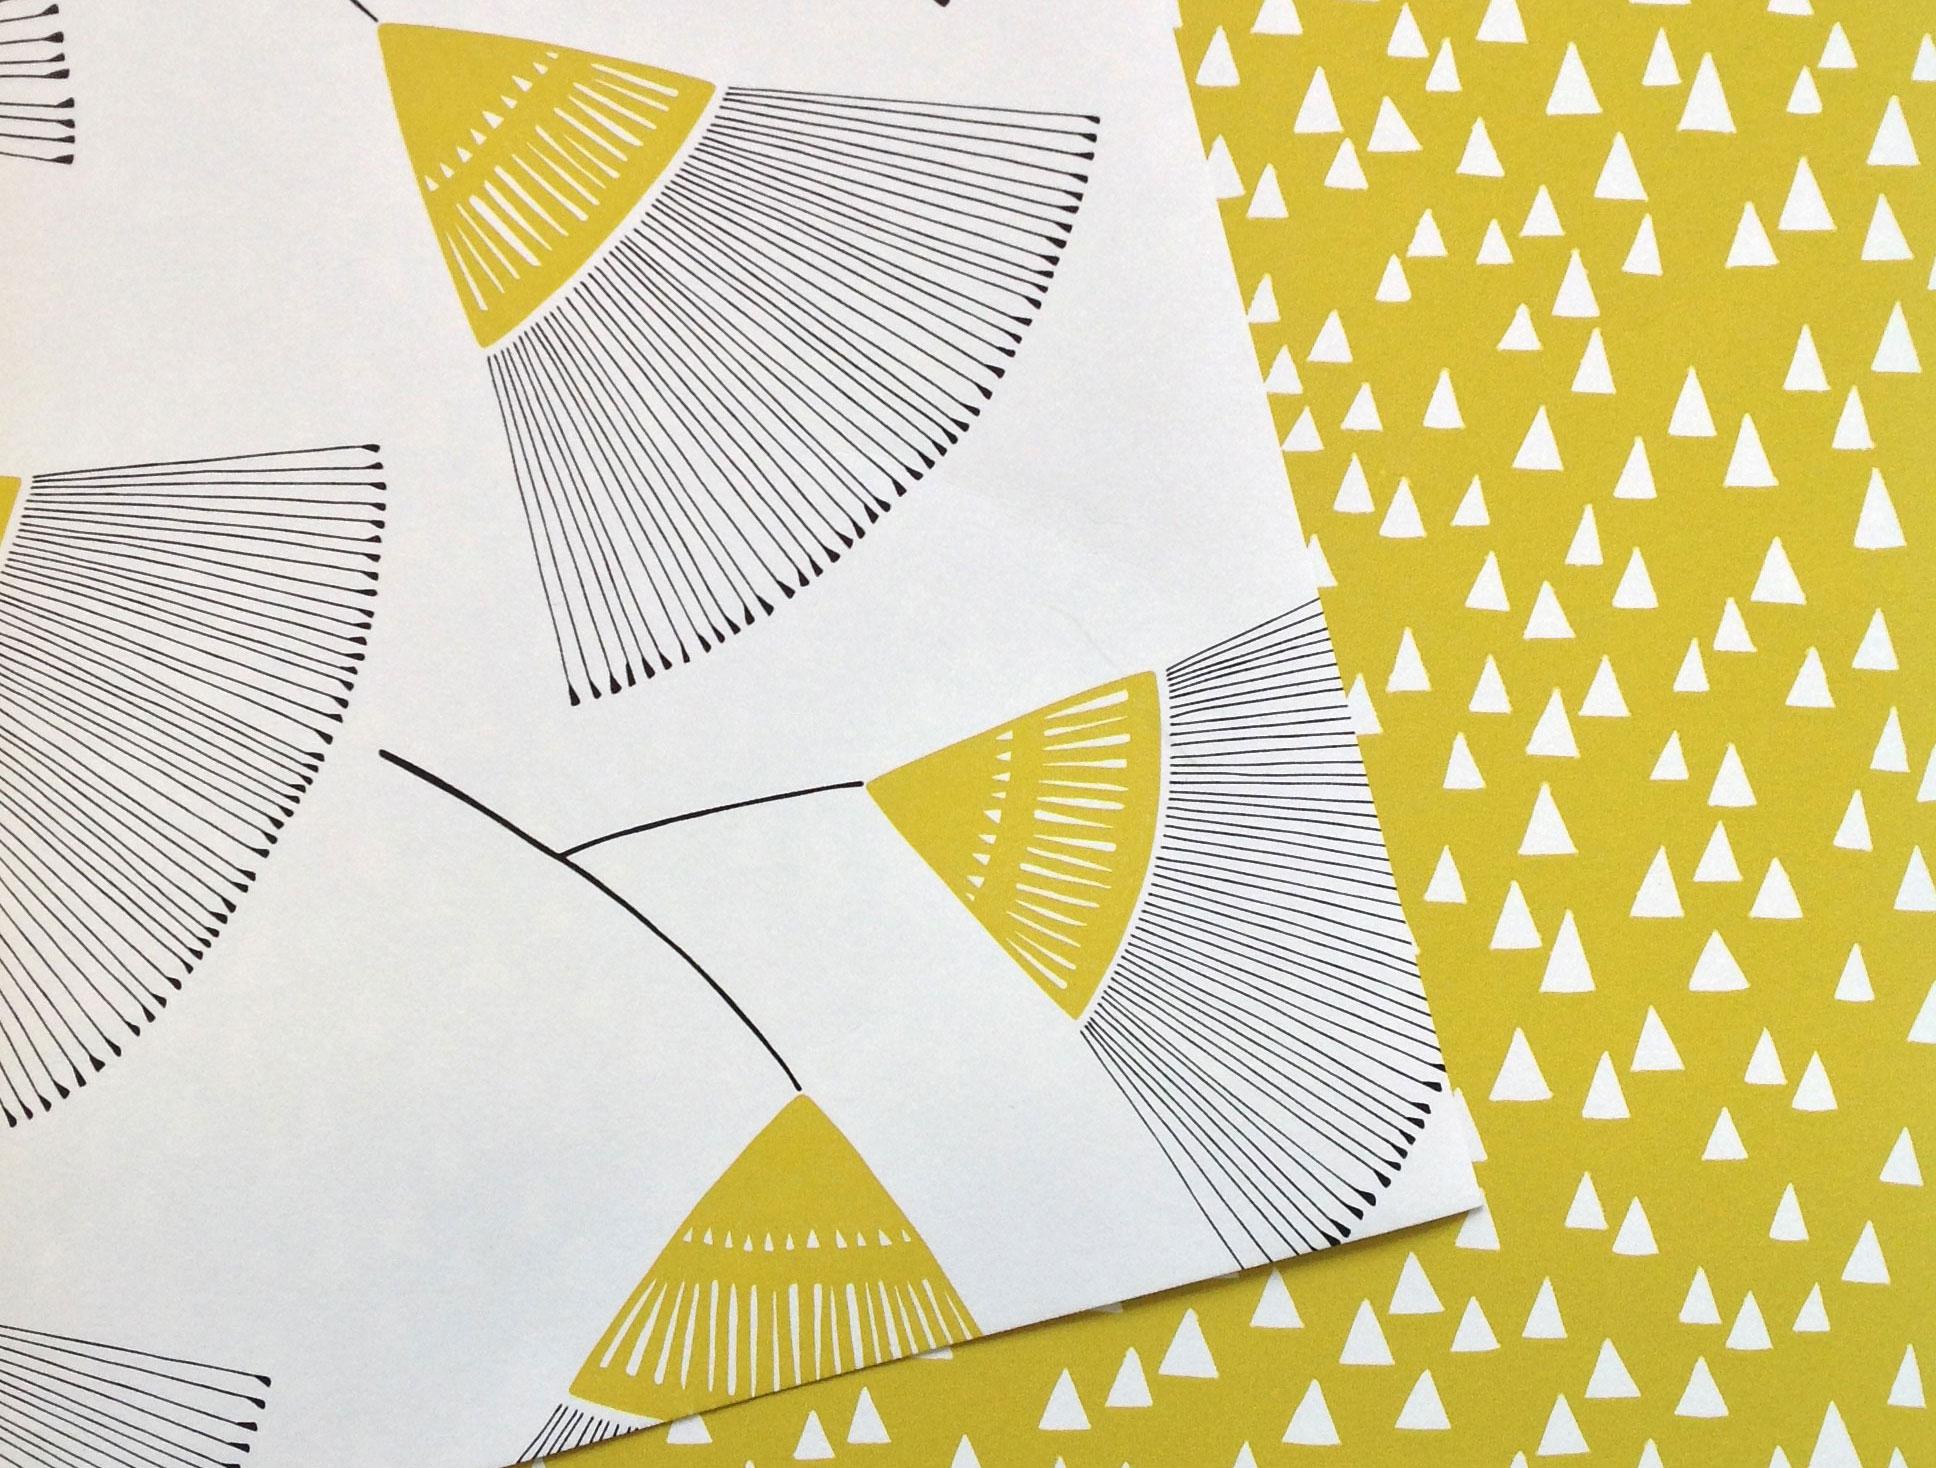 Retrokollektion-gula-tapeter-Five-Lands-Miss-Print-midbec-